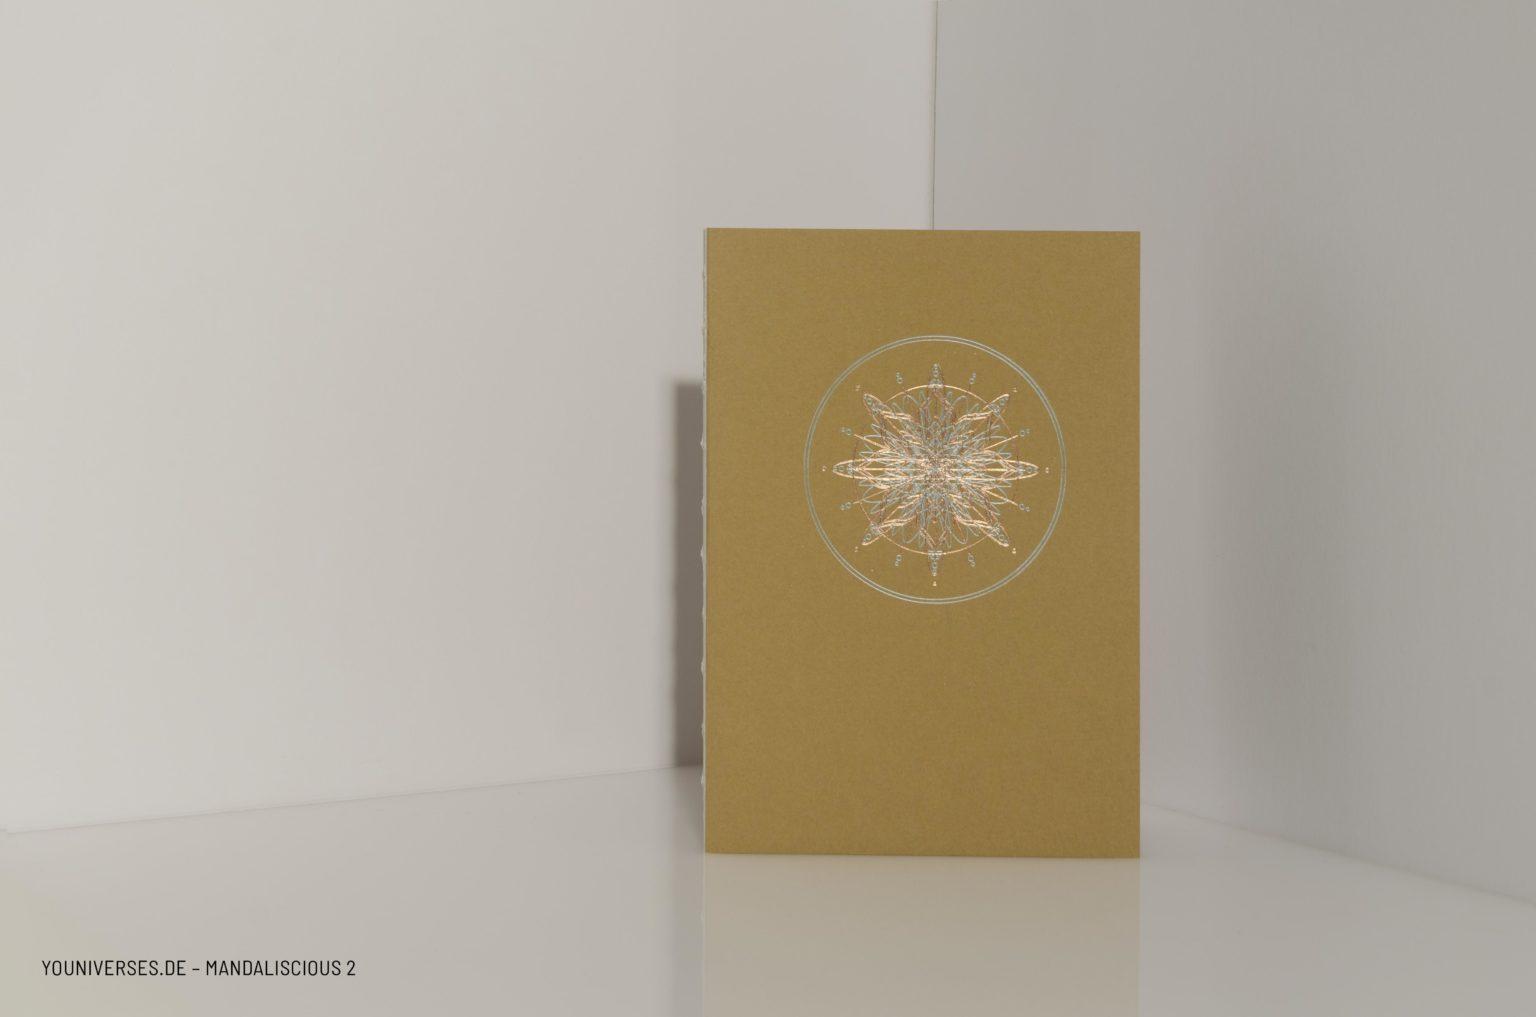 Youniverses, Reihe: mandaliscious Design-N°.: 2 Farben: Mint & Roségold, Yournal, Journal, Diary, Bulletjournal, Tagebuch, Skizzenbuch, Veredelung, DIY, Handmade, Papeterie.